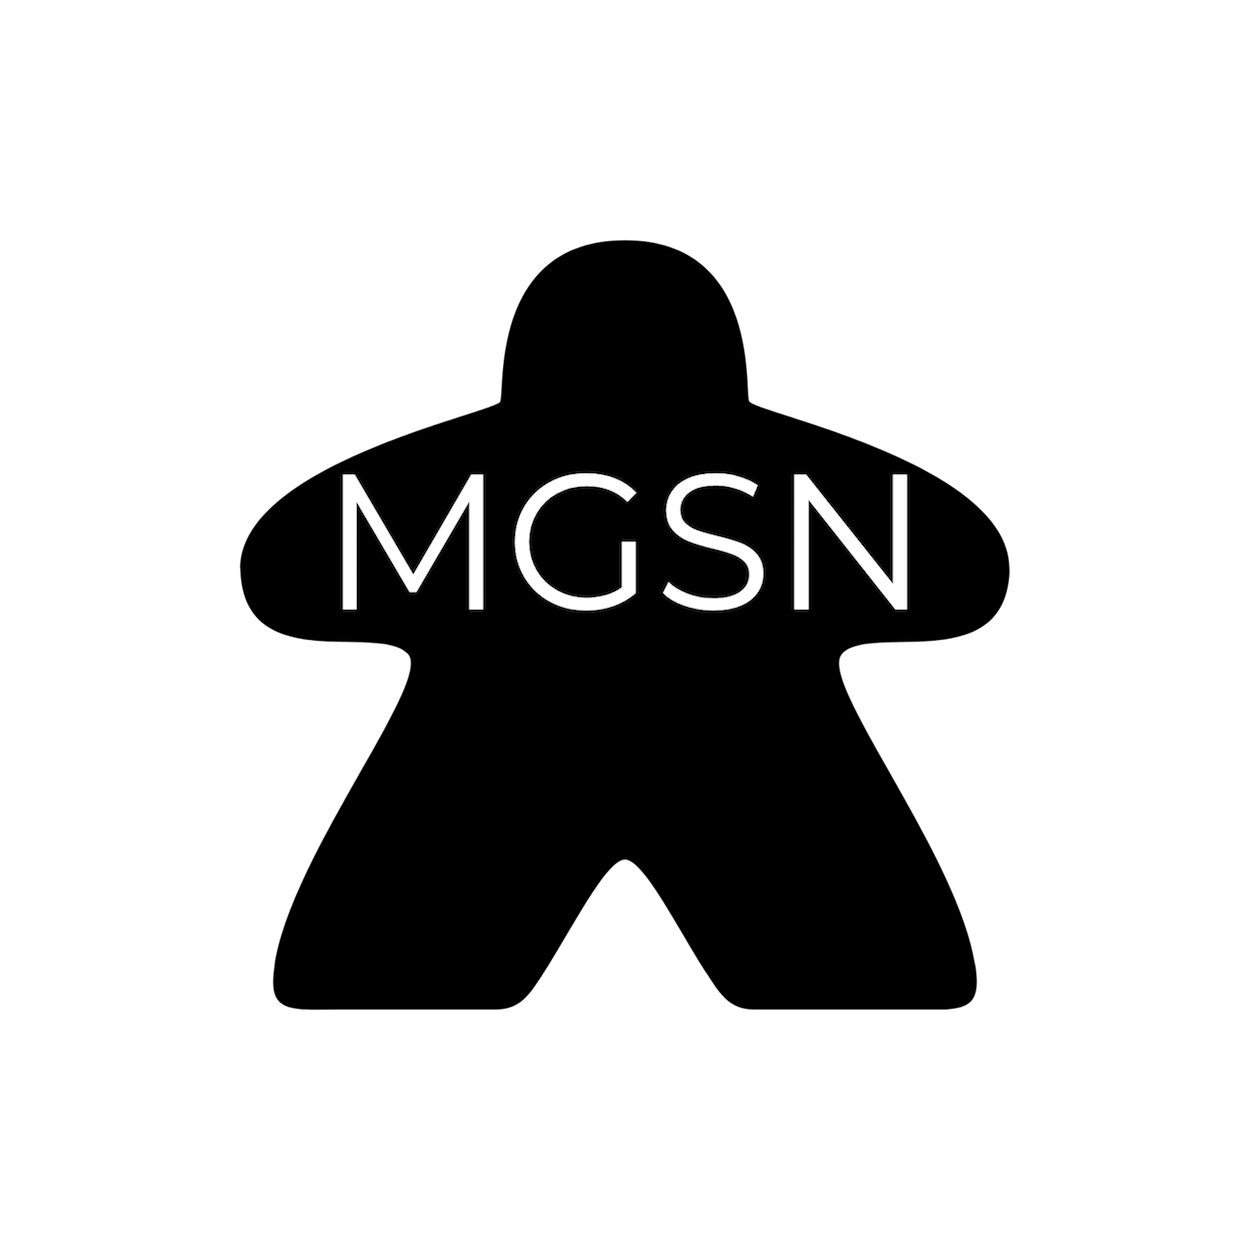 MGSN-logo-black.png